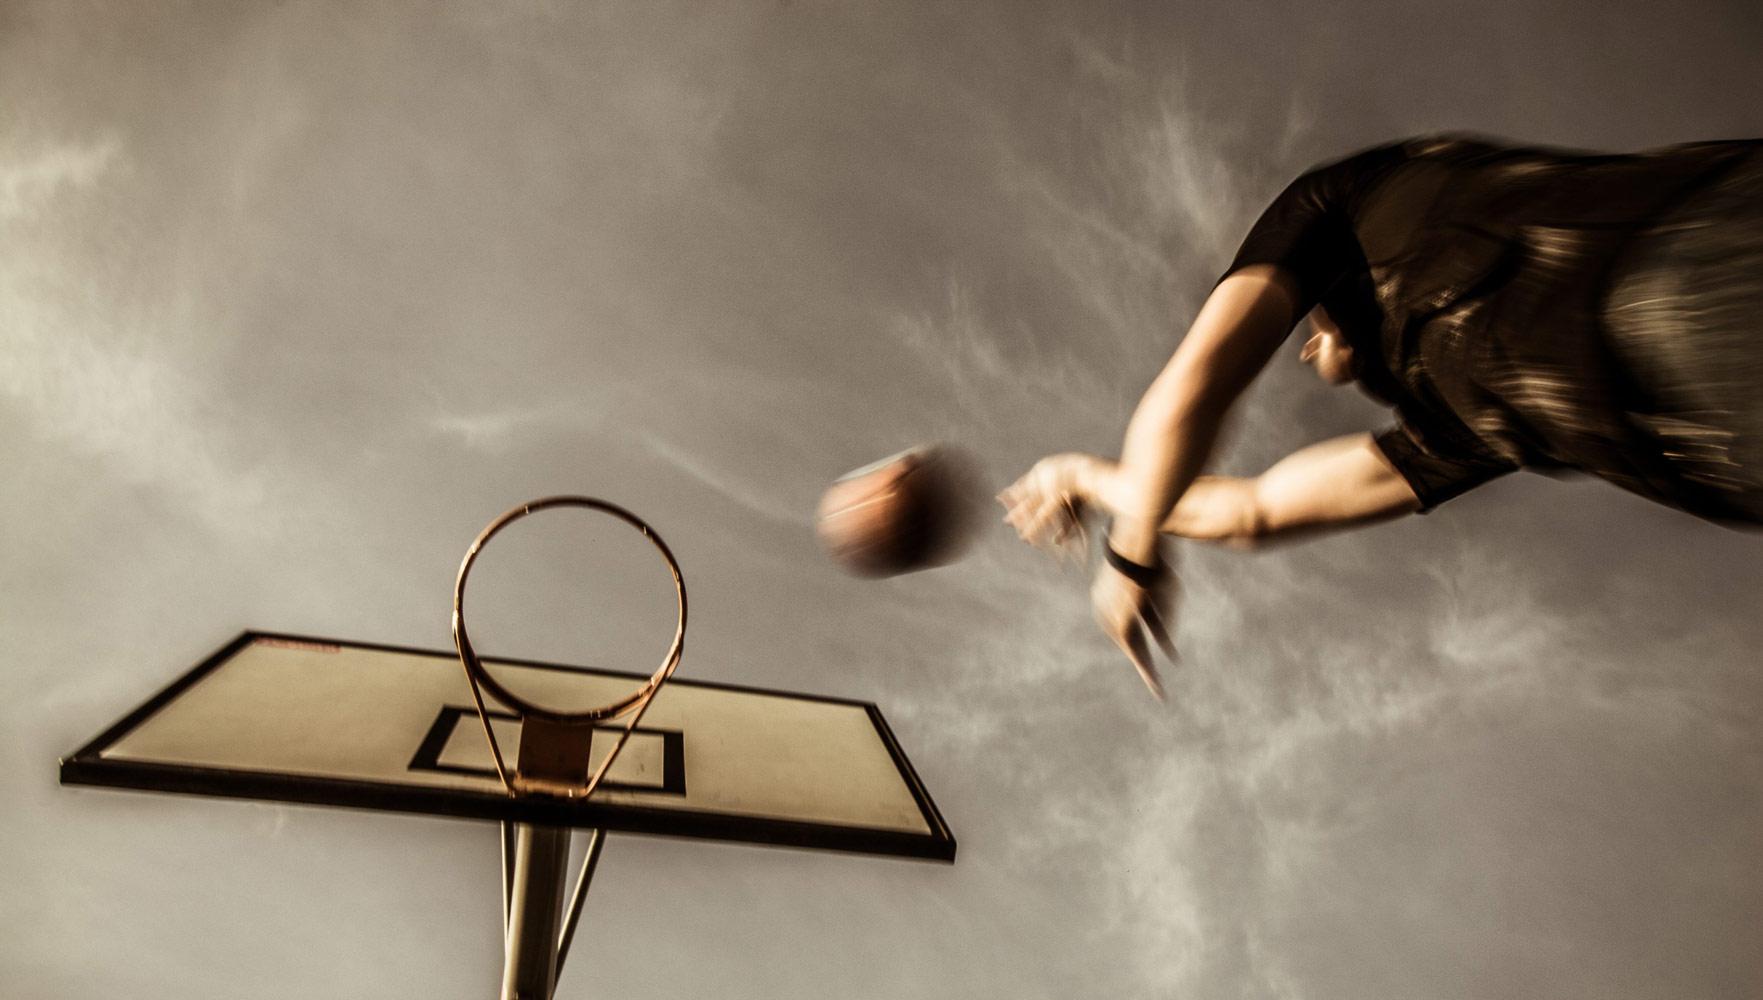 © Андерсон Барбоза, Фотоконкурс Международной федерации баскетбола — FIBA Photo Contest